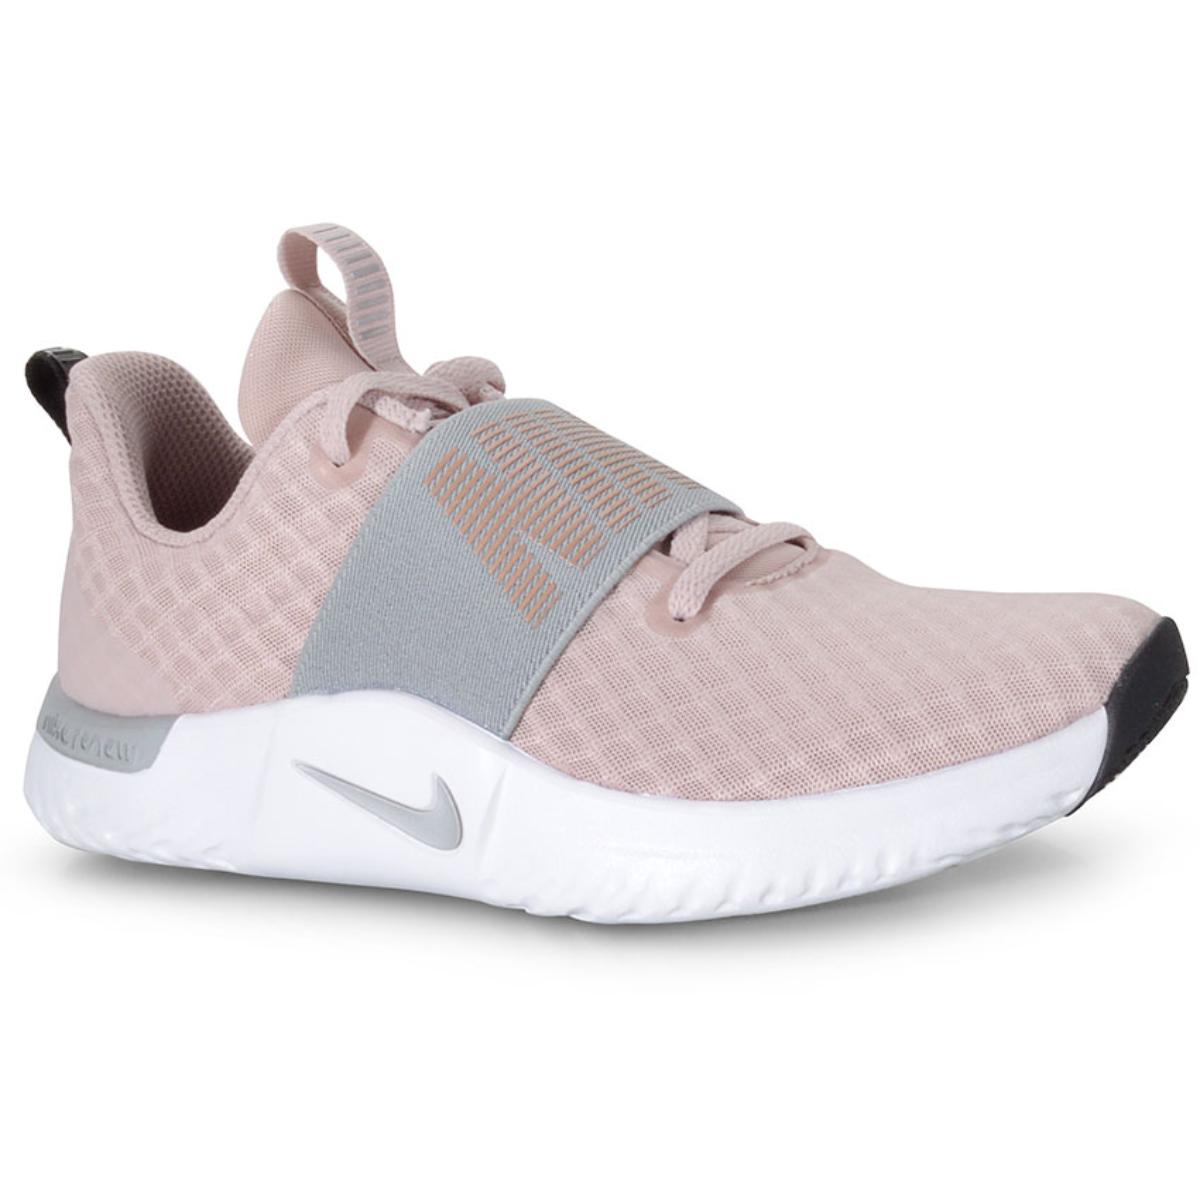 Tênis Feminino Nike Ar4543-200 in Season tr 9 Rosa Claro